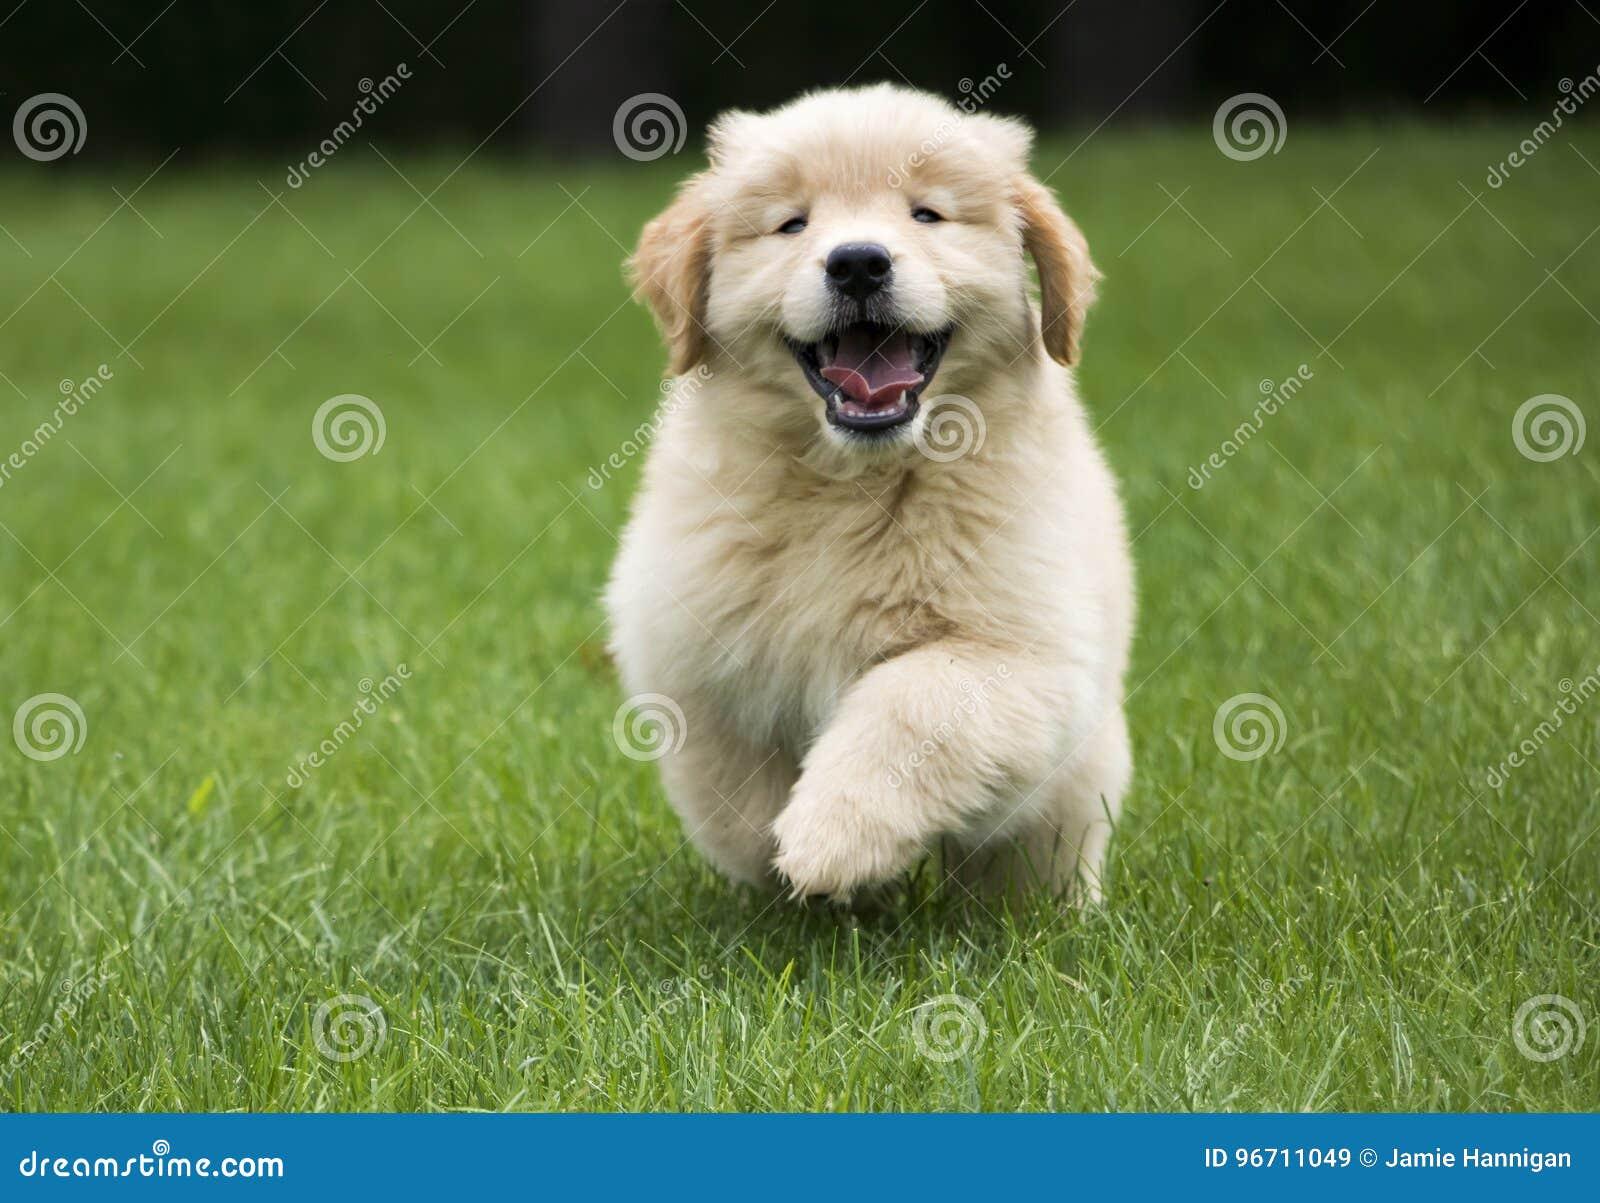 Happy Golden Retriever Puppy